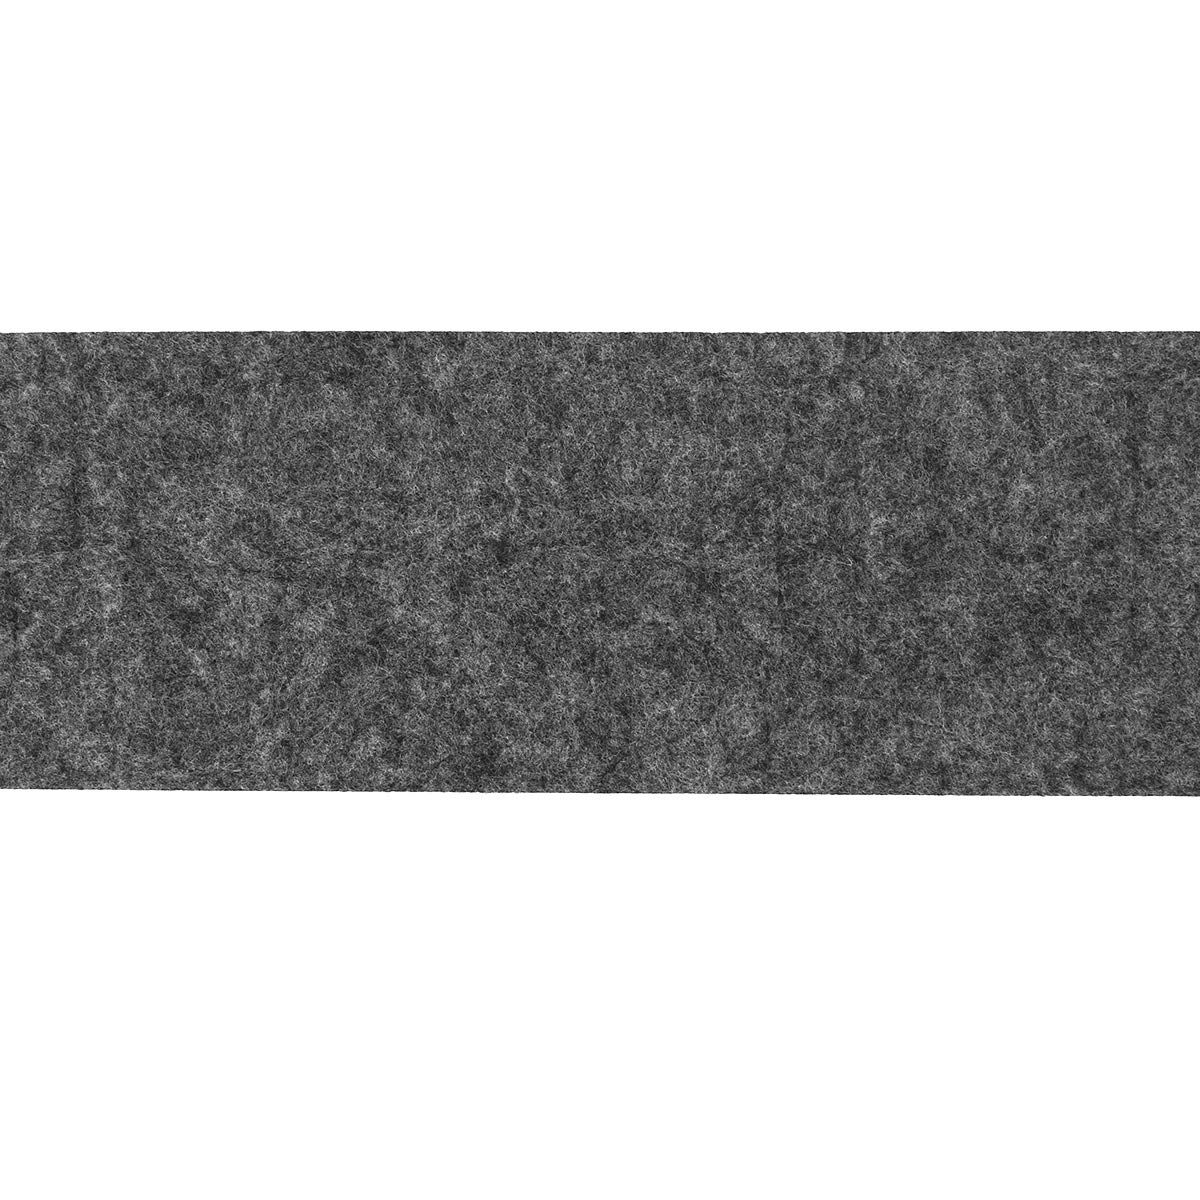 Rutschfest VORCOOL Filzpads Hartholzb/öden 100 x 10 cm Dunkelgrau rechteckig Filzgleiter f/ür M/öbelf/ü/ße